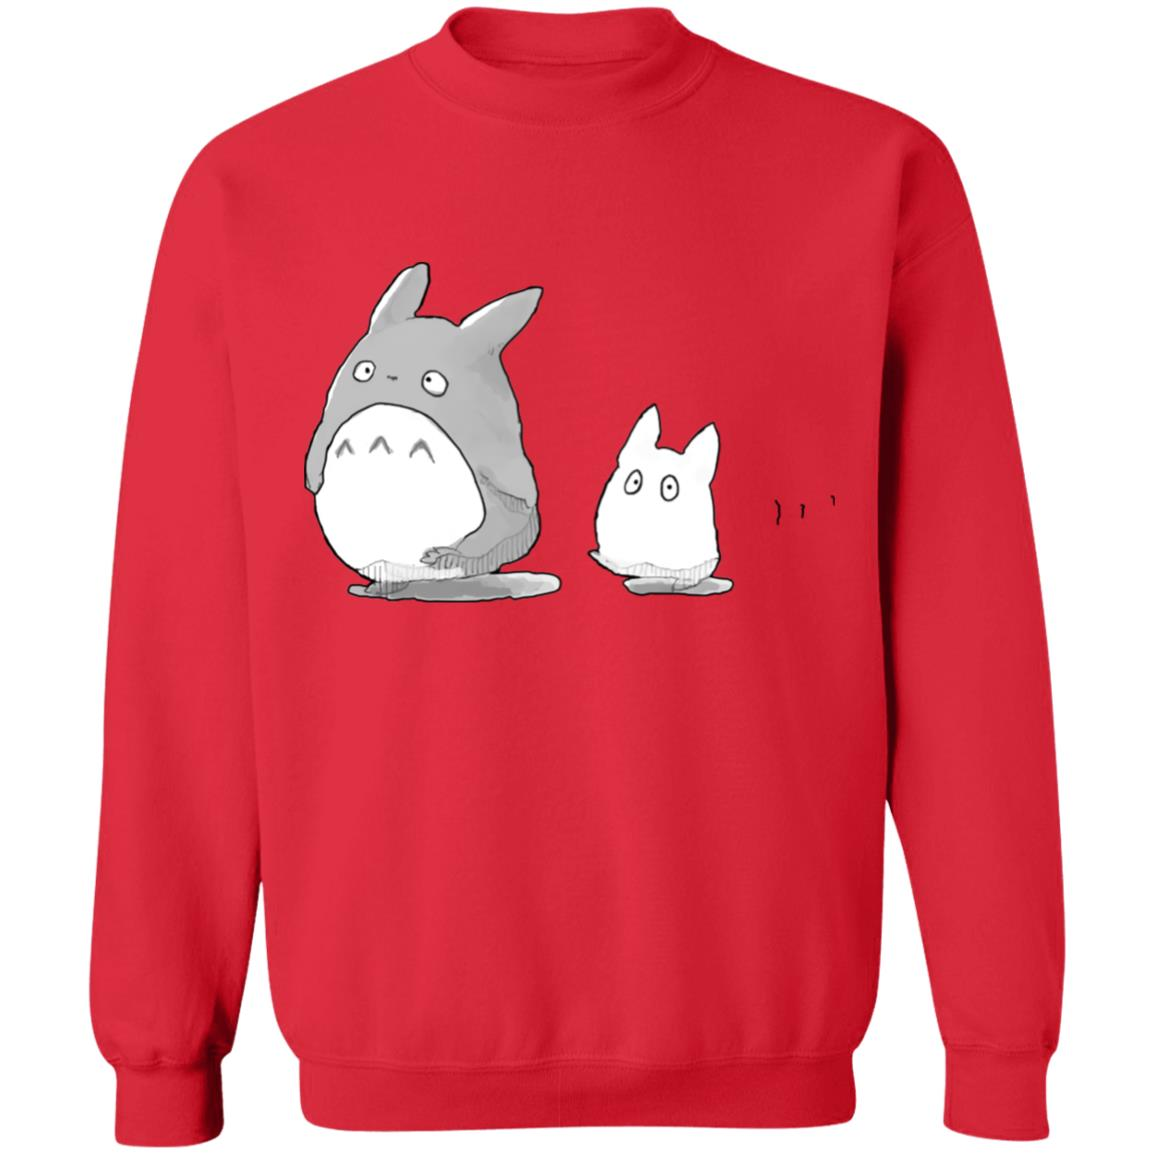 Walking Mini Totoro Sweatshirt